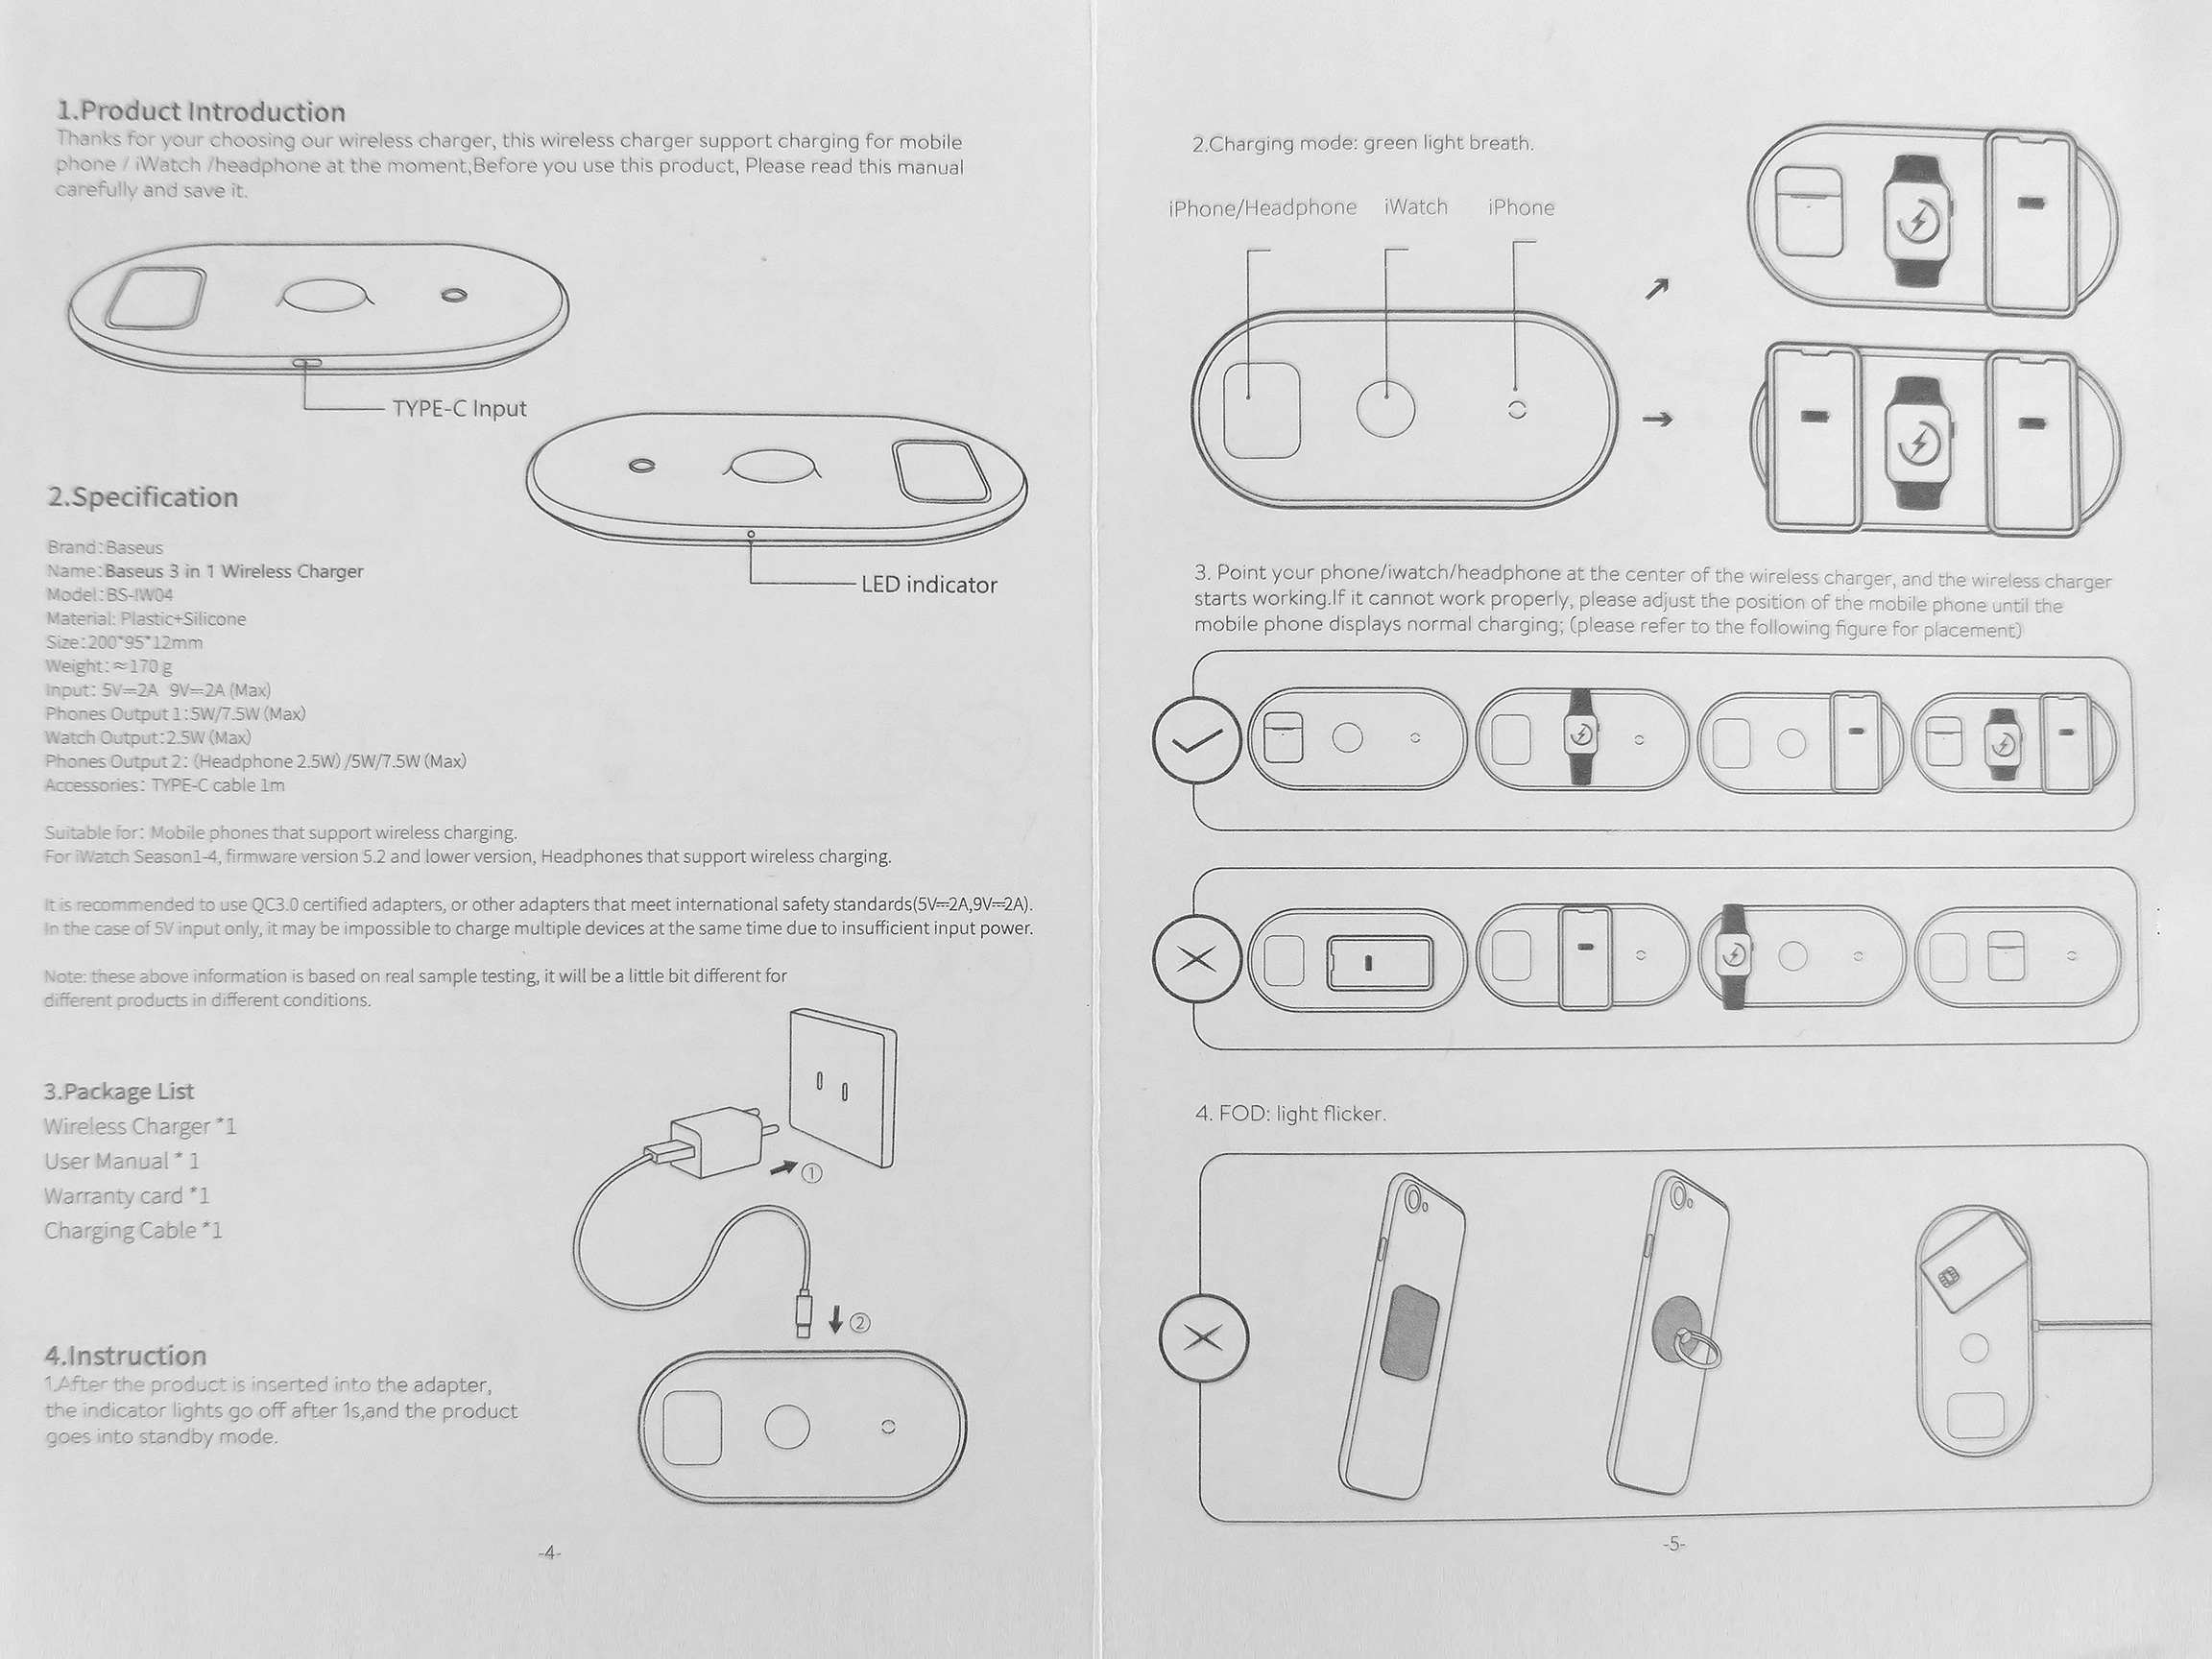 Инструкция Baseus Wireless Charger 3 in 1 (BS-IW04)